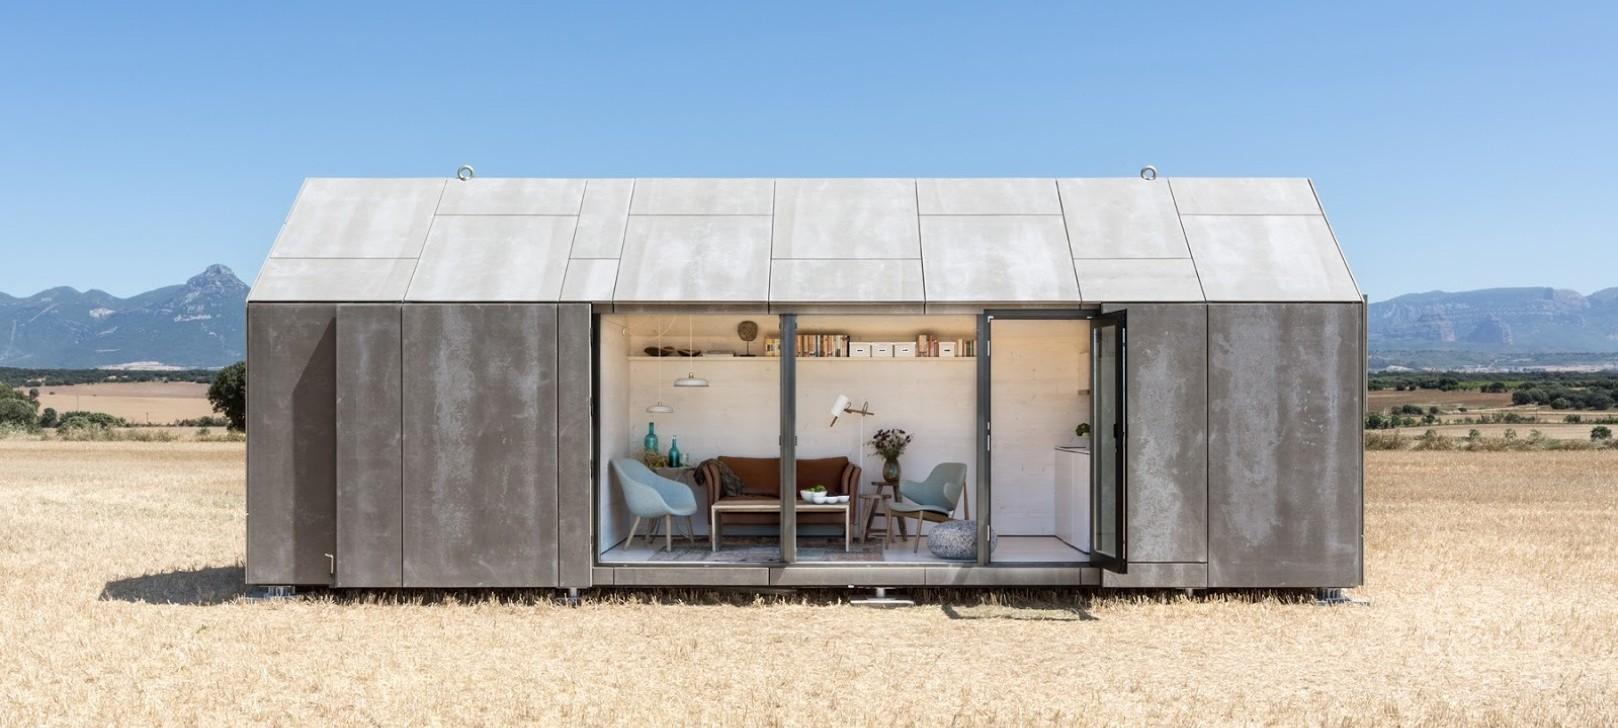 casa-transportable-1-1022484